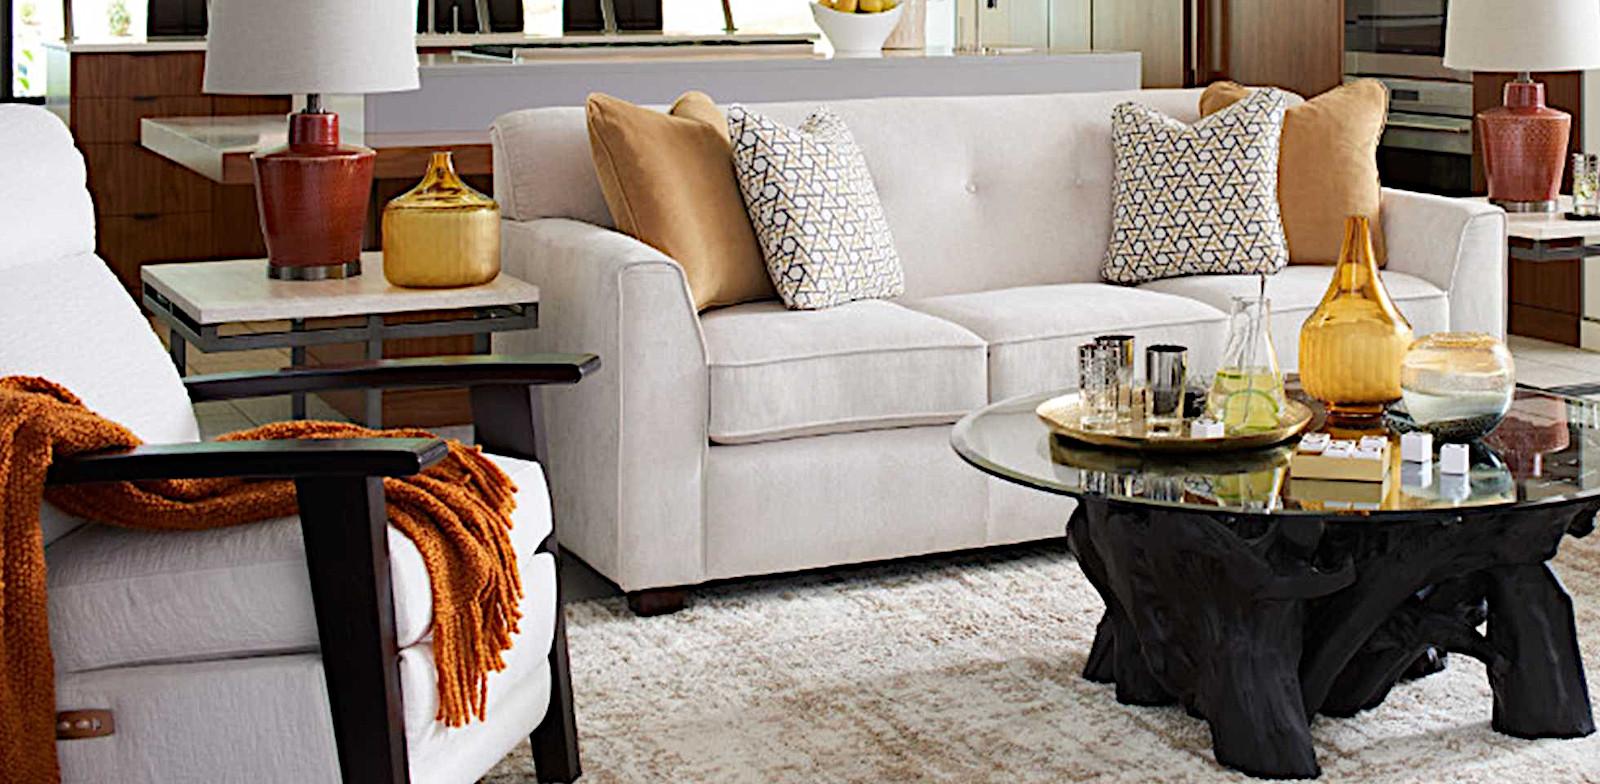 Impressive Mid-century modern furniture